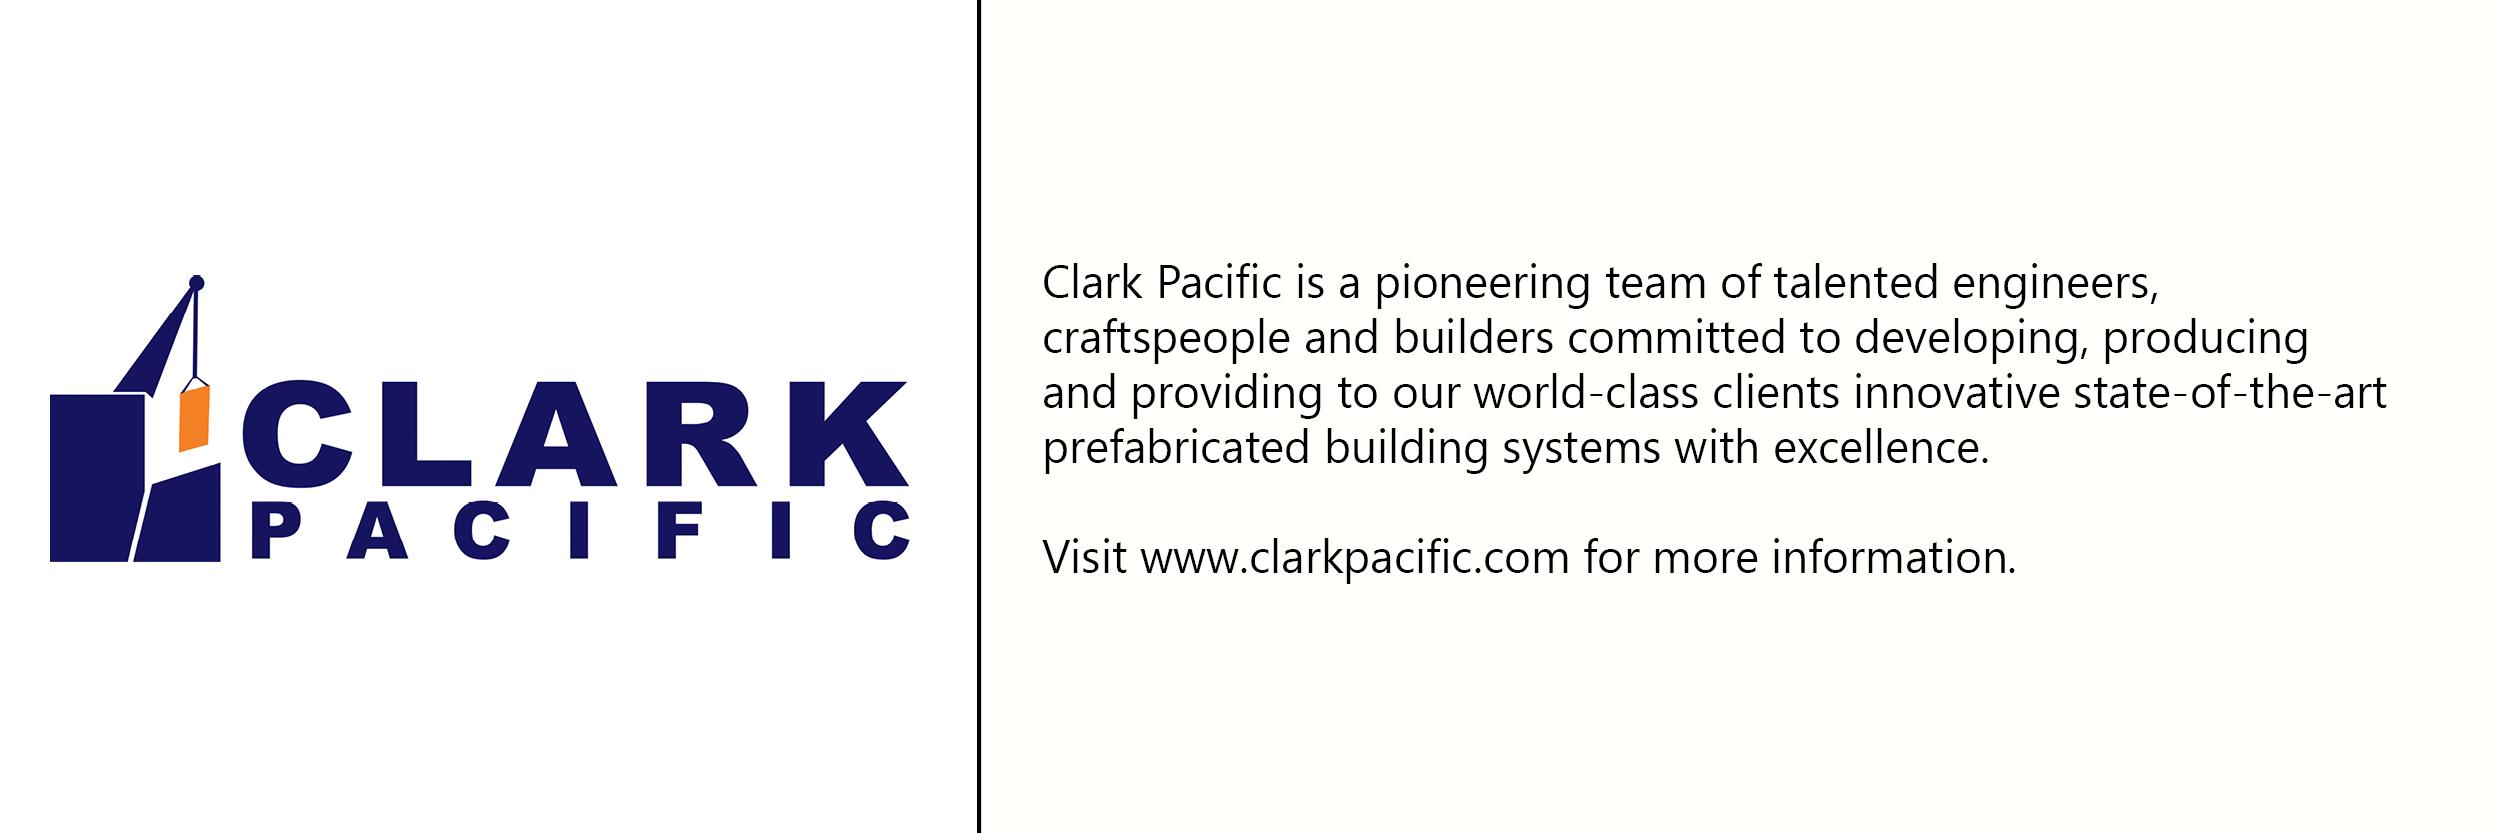 Clark Pacific  logo with description of company